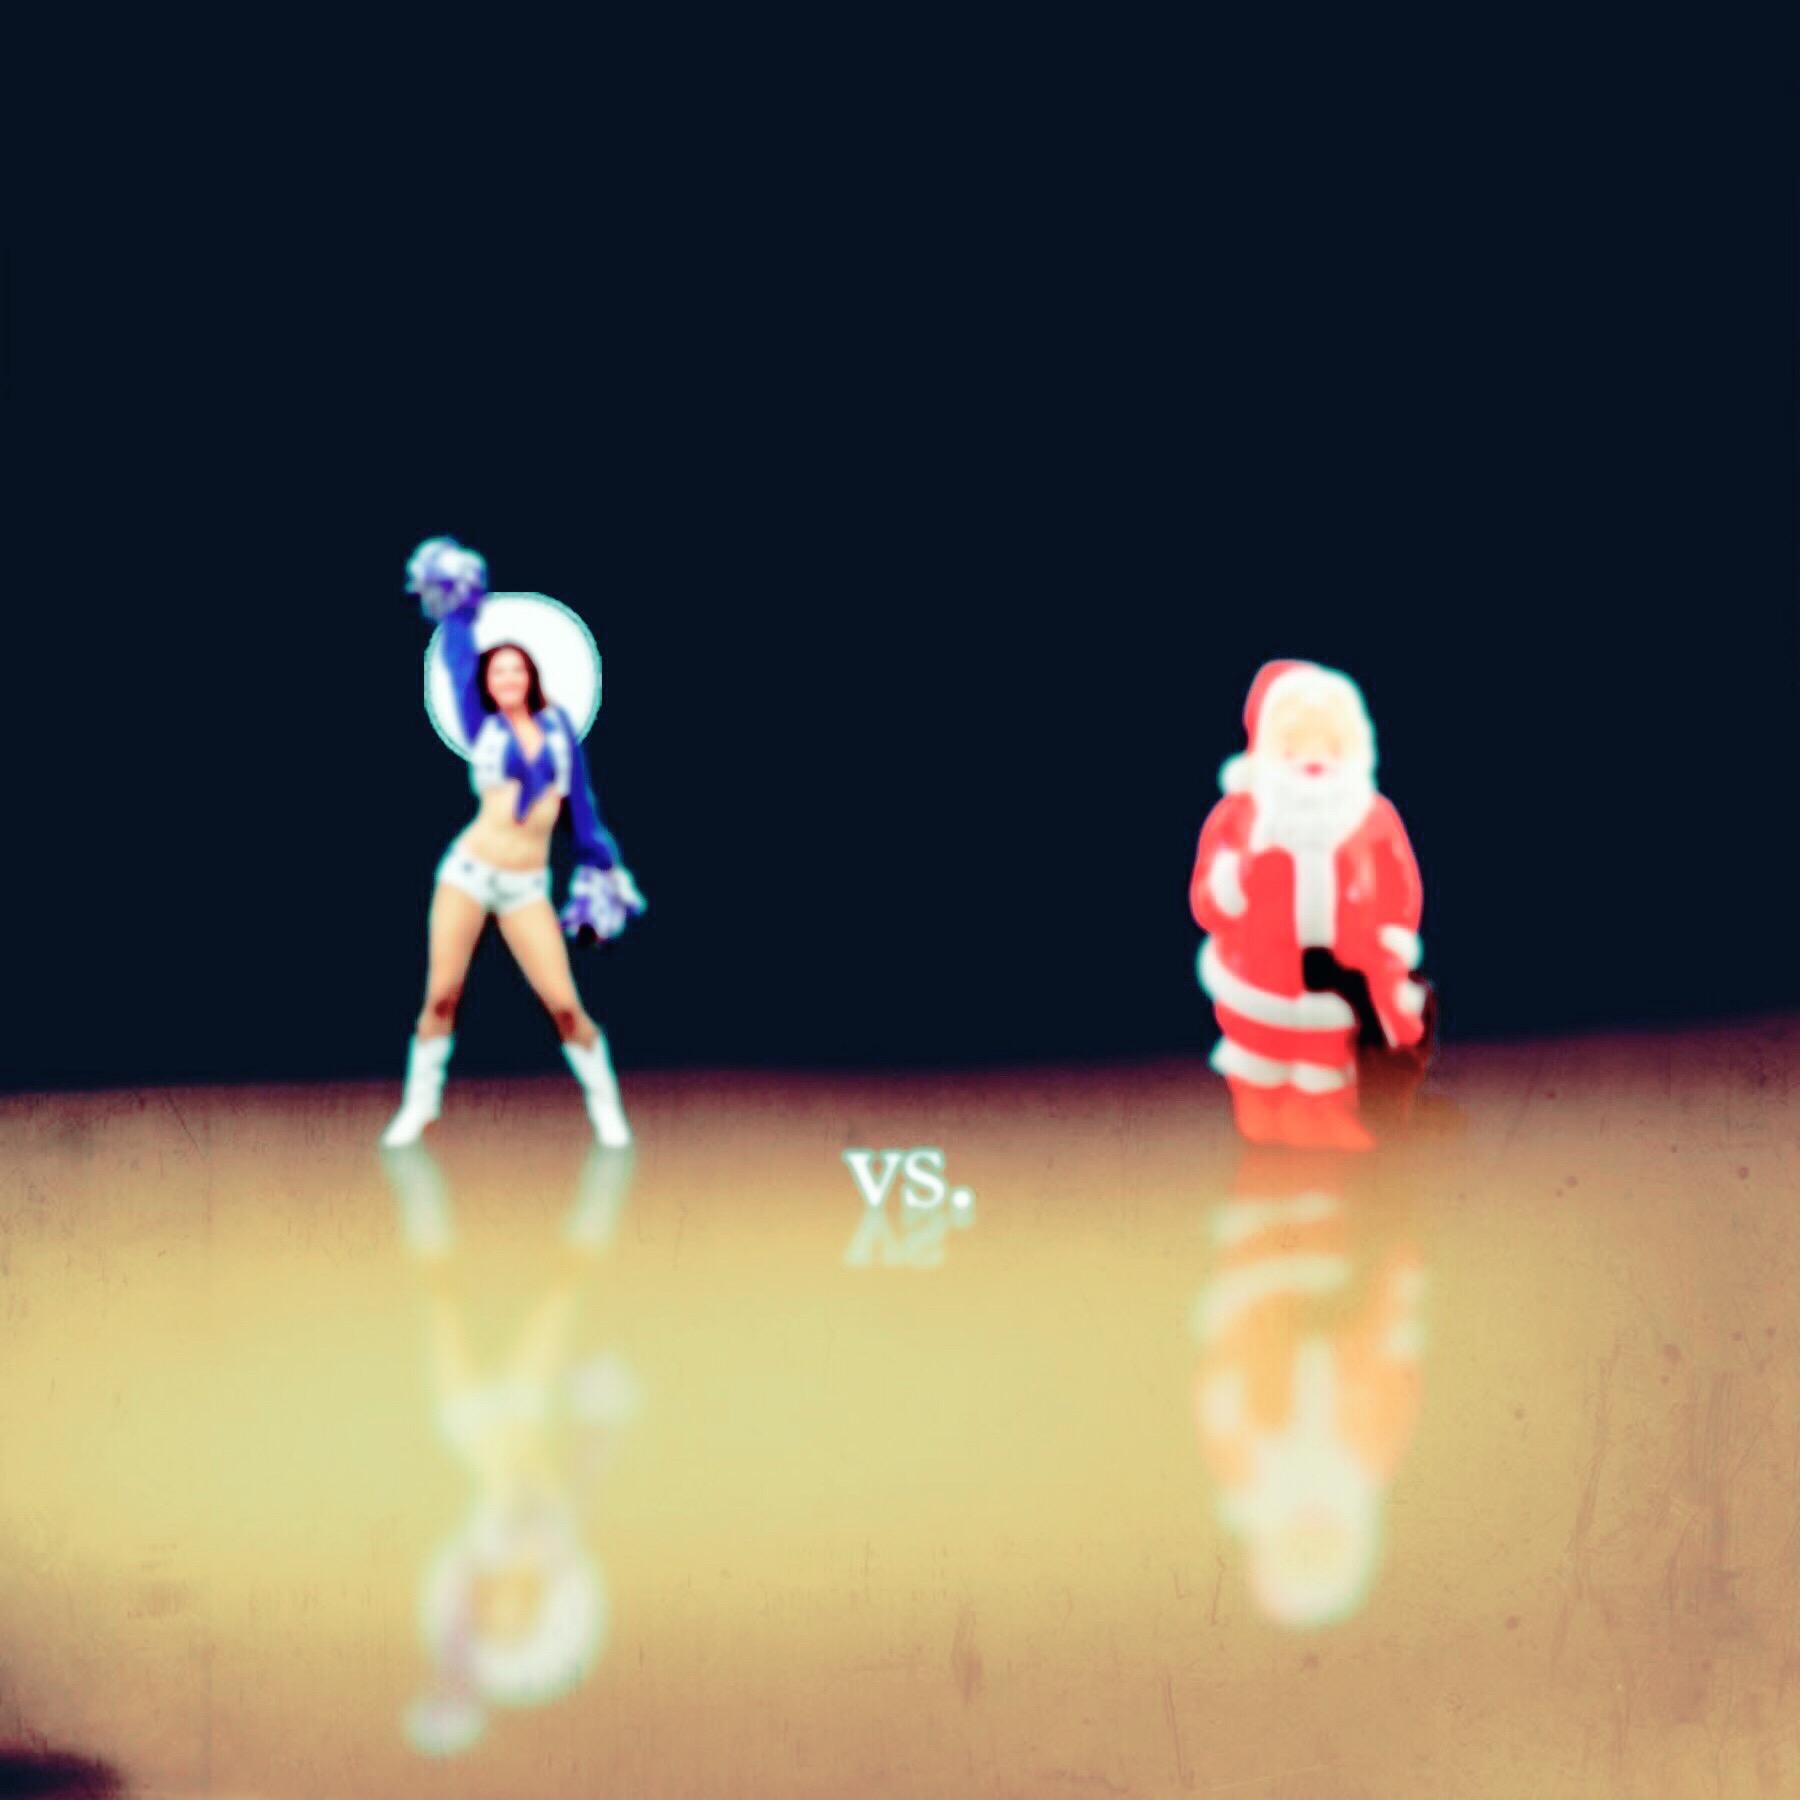 Cheerleader vs. Plastic Santa